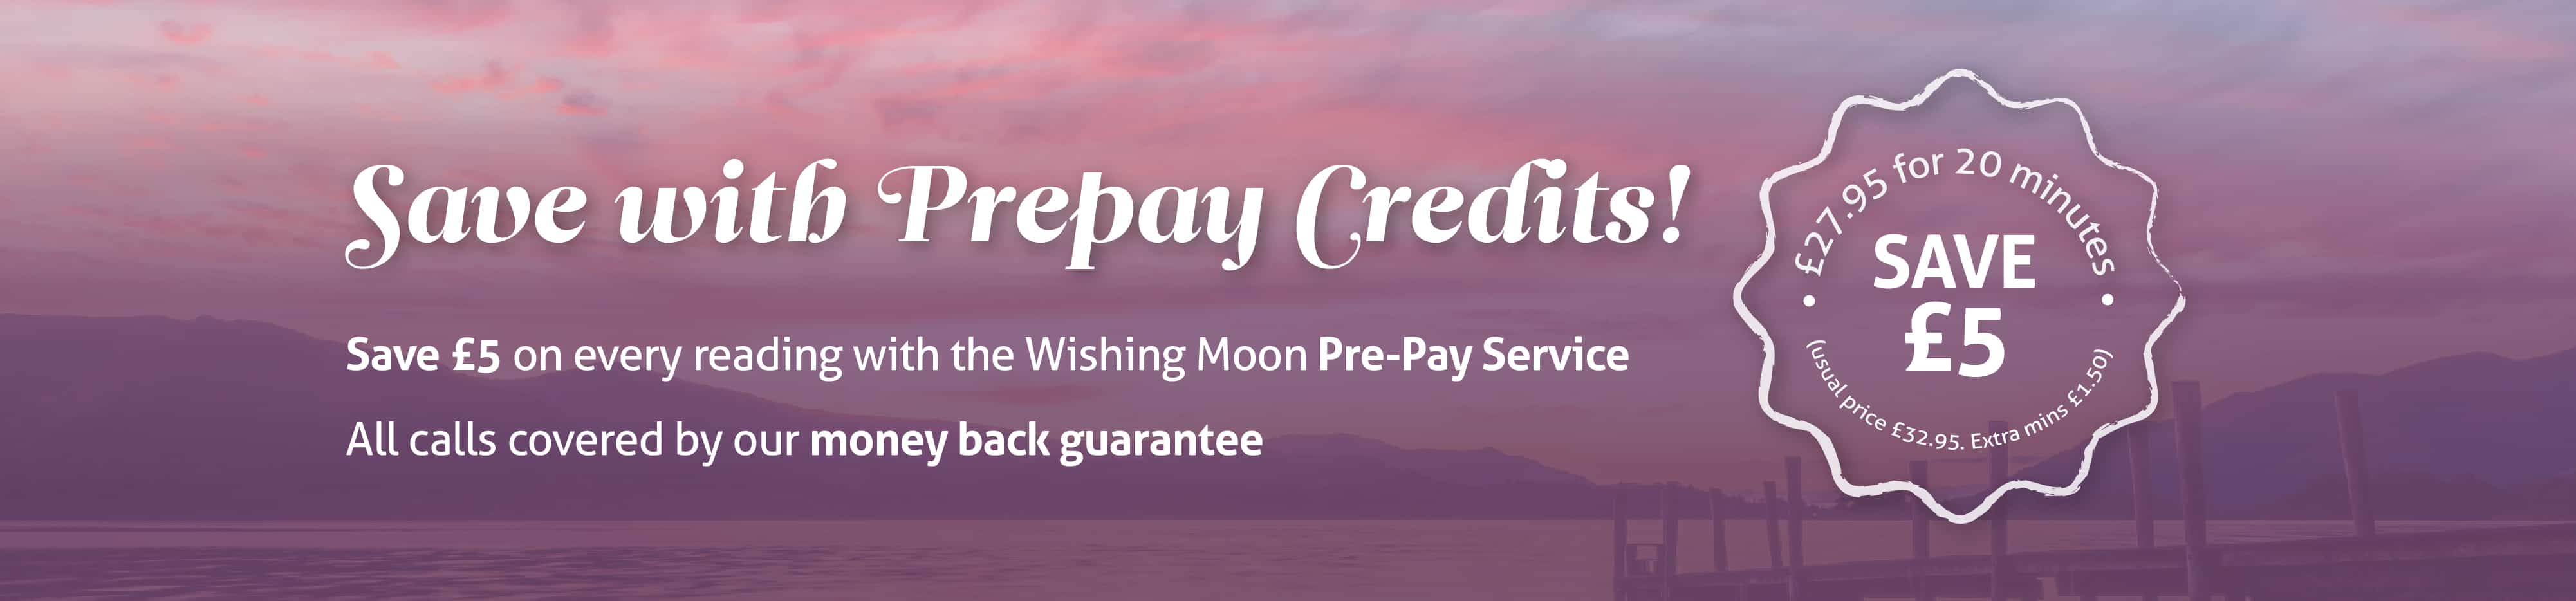 prepay wishing moon